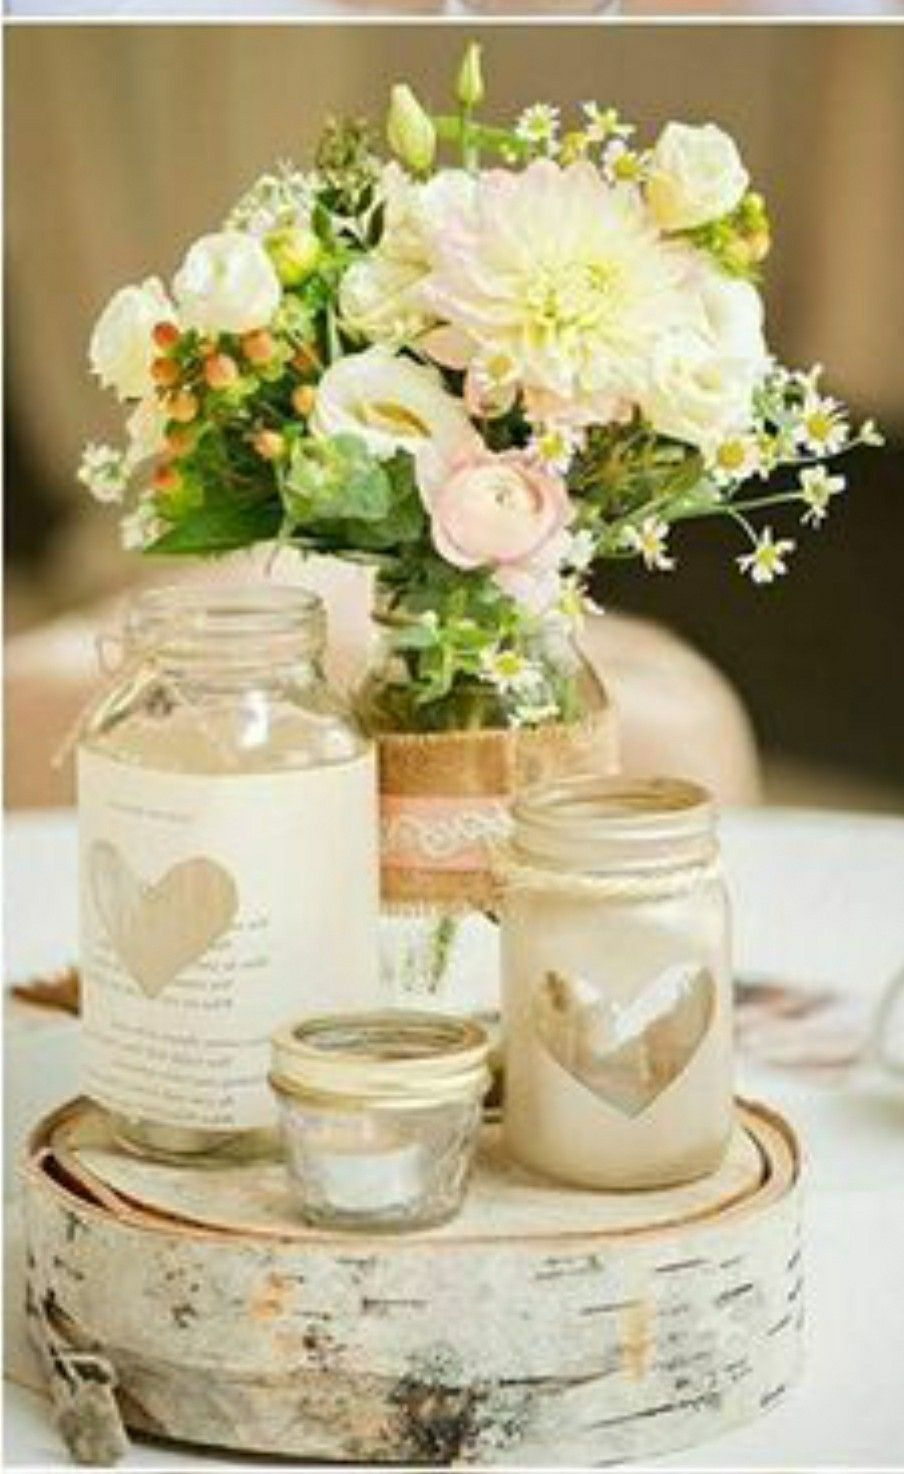 Pin By Vikki Hilario On Wine Bottle Decor In 2020 Wedding Centerpieces Diy Rustic Diy Wedding Decorations Wedding Table